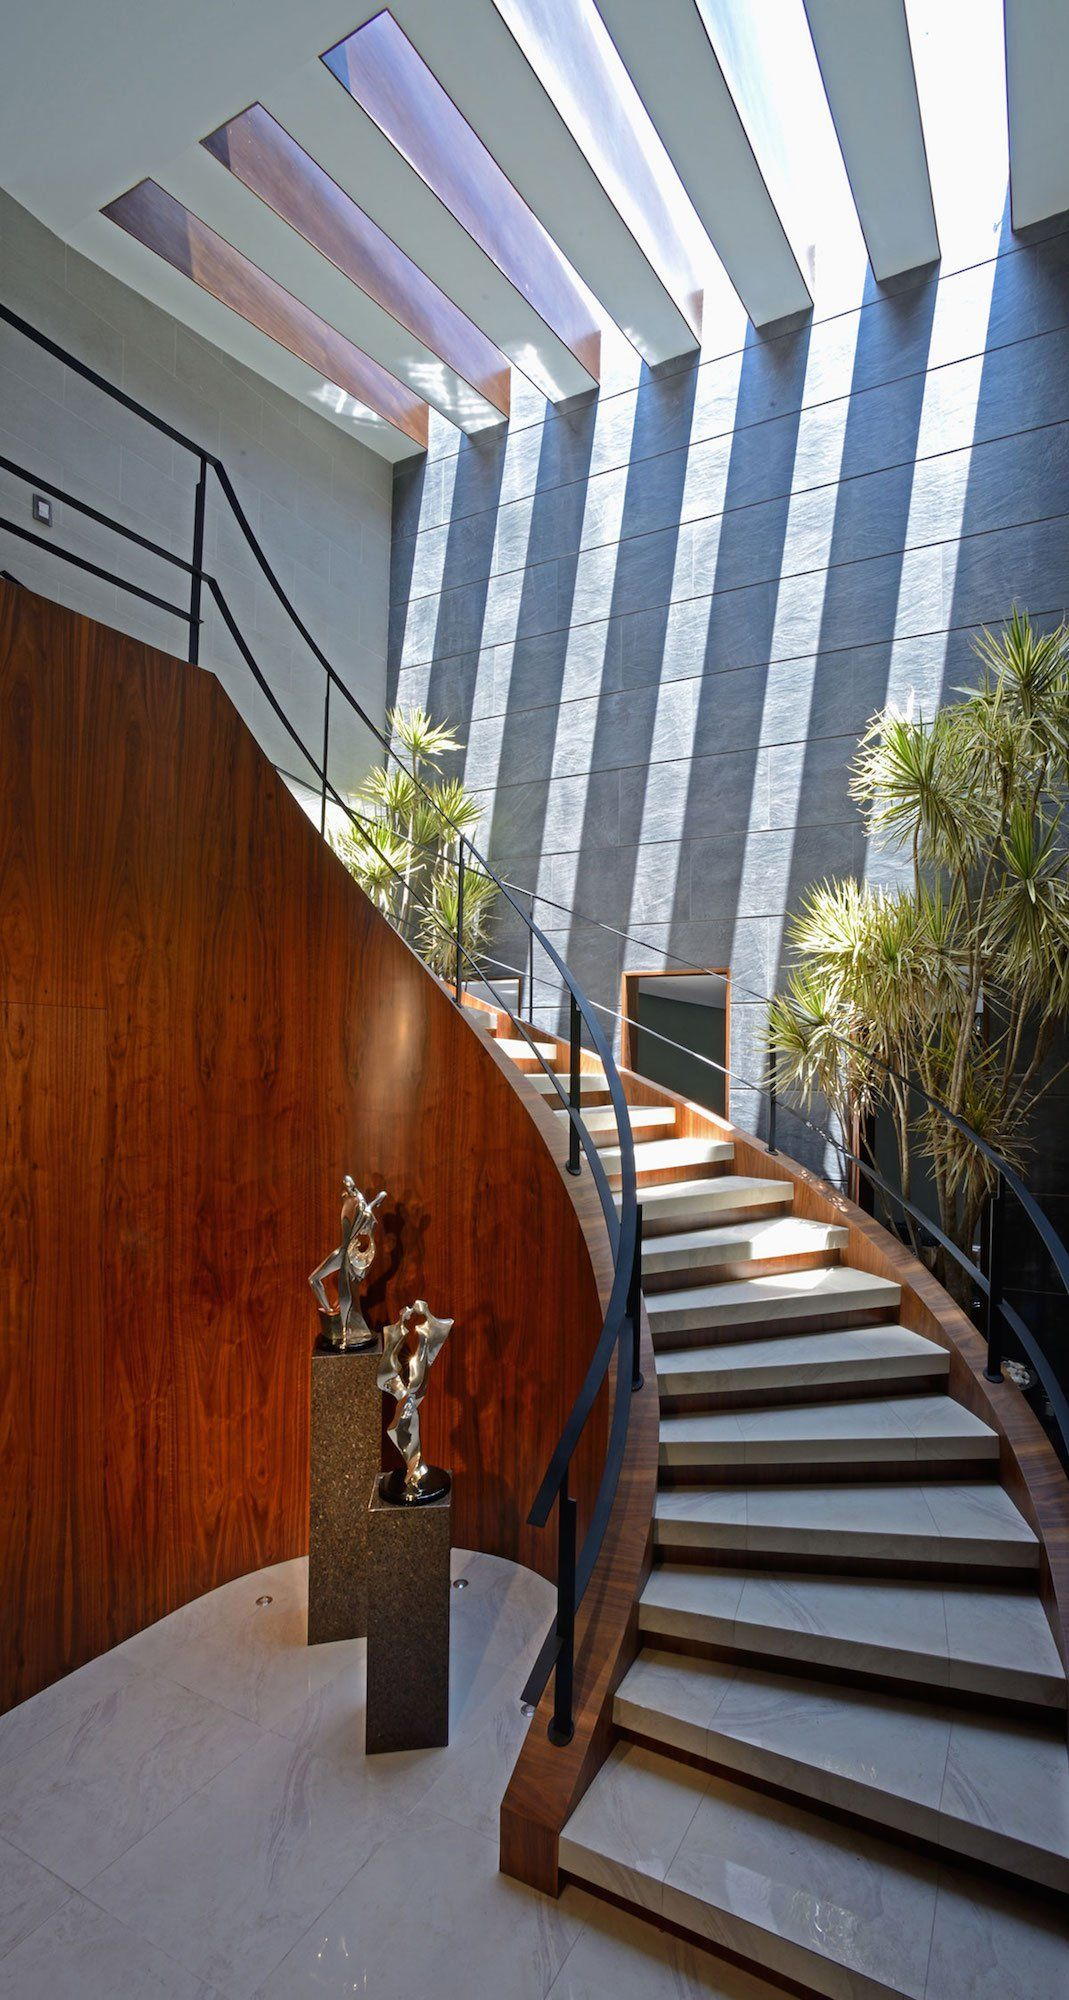 diseo de escaleras modernas ovaladas